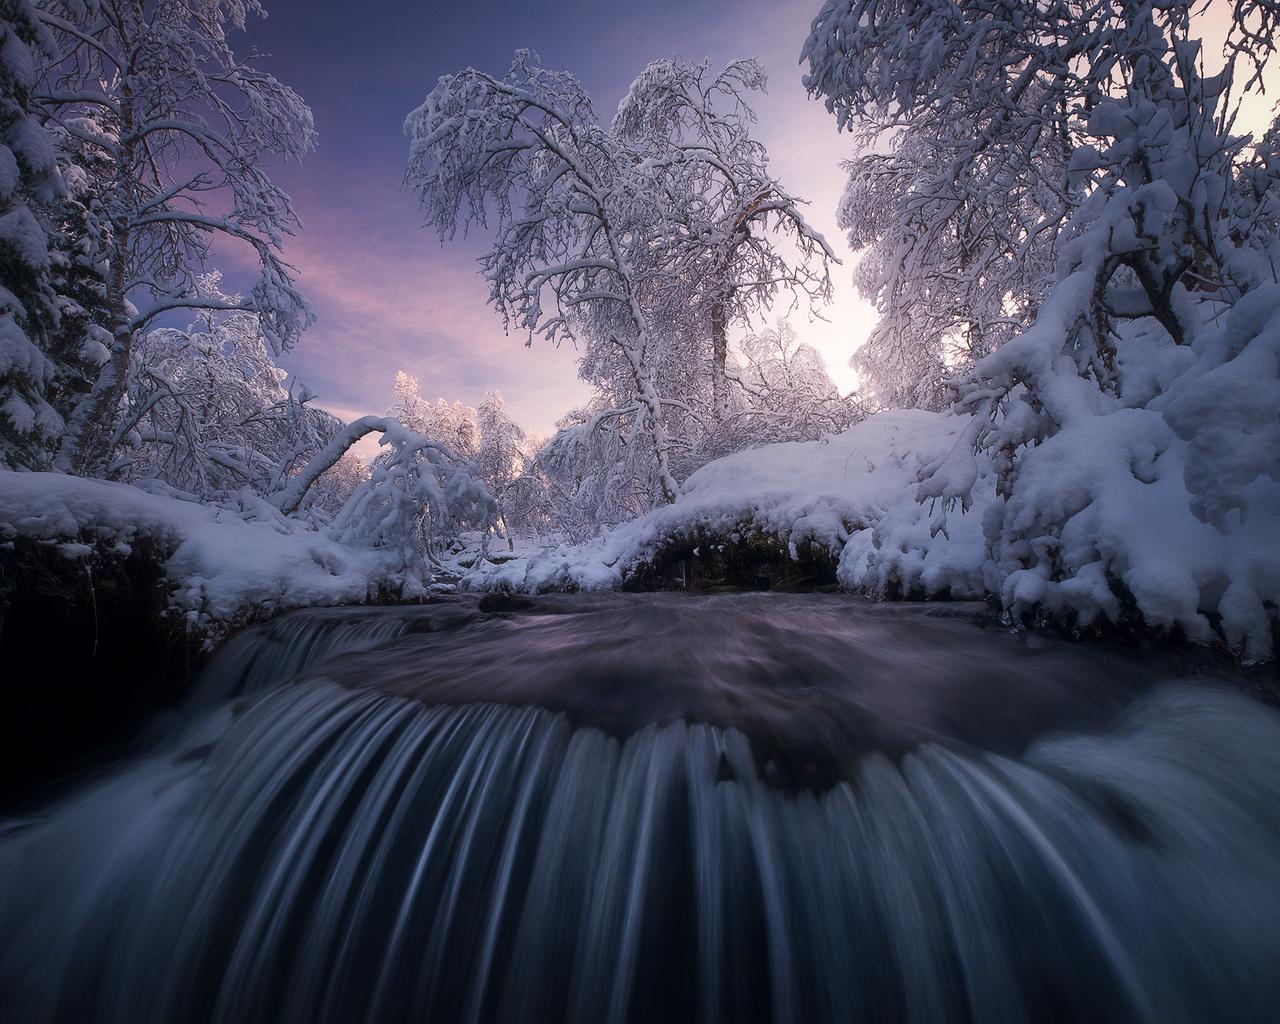 зима, снег, деревья, пейзаж, закат, природа, река, водопад, норвегия, каскад, порог, arild heitmann